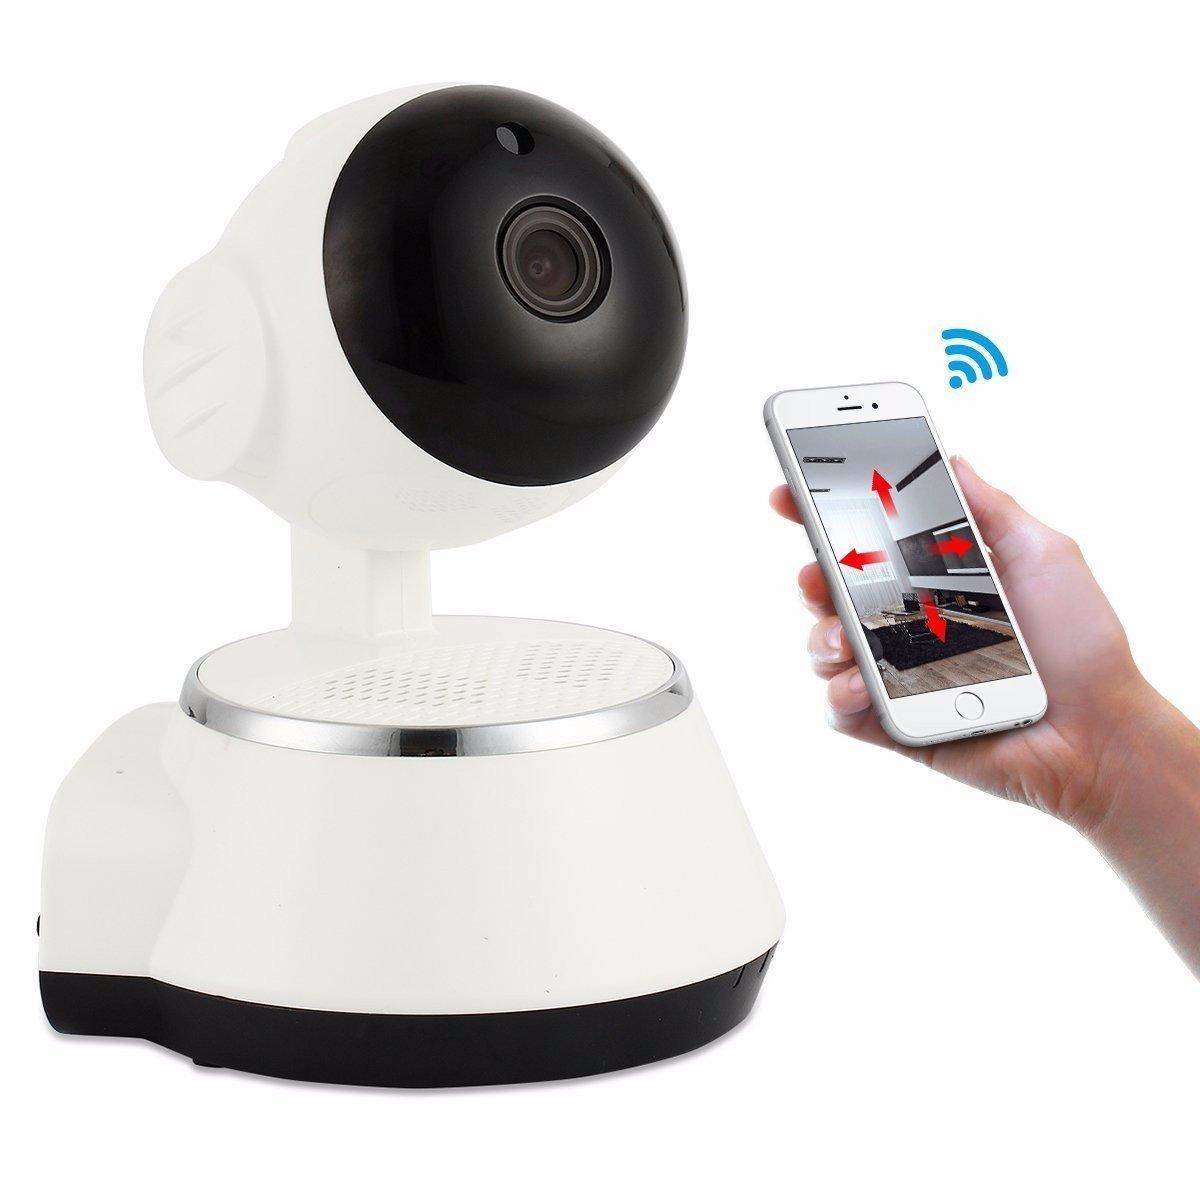 Wireless Camera, ARCHEER WiFi Baby Monitor Alarm Home: Amazon.co.uk ...